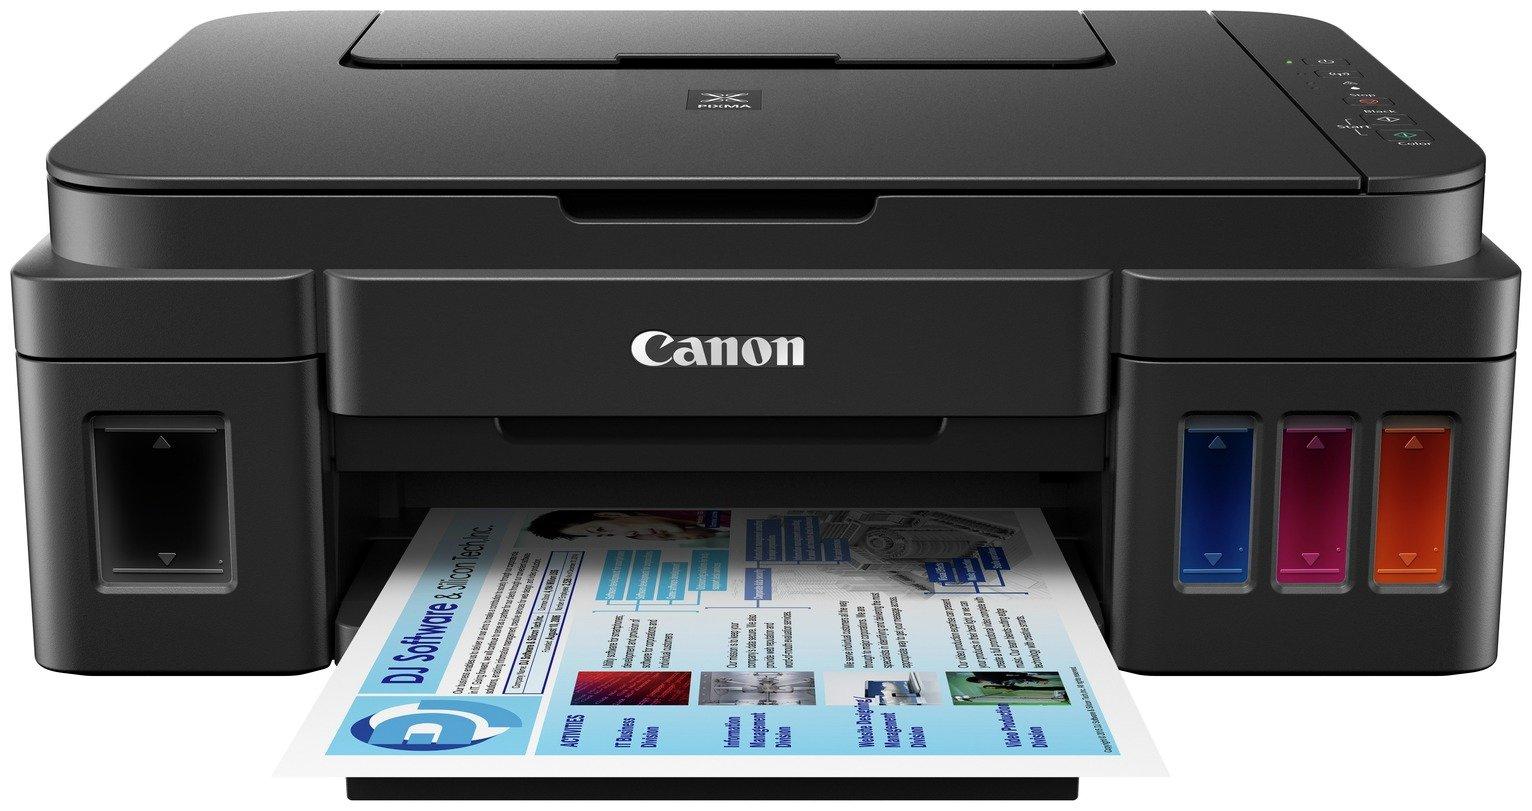 Canon G3501 Wireless Ink Tank Printer